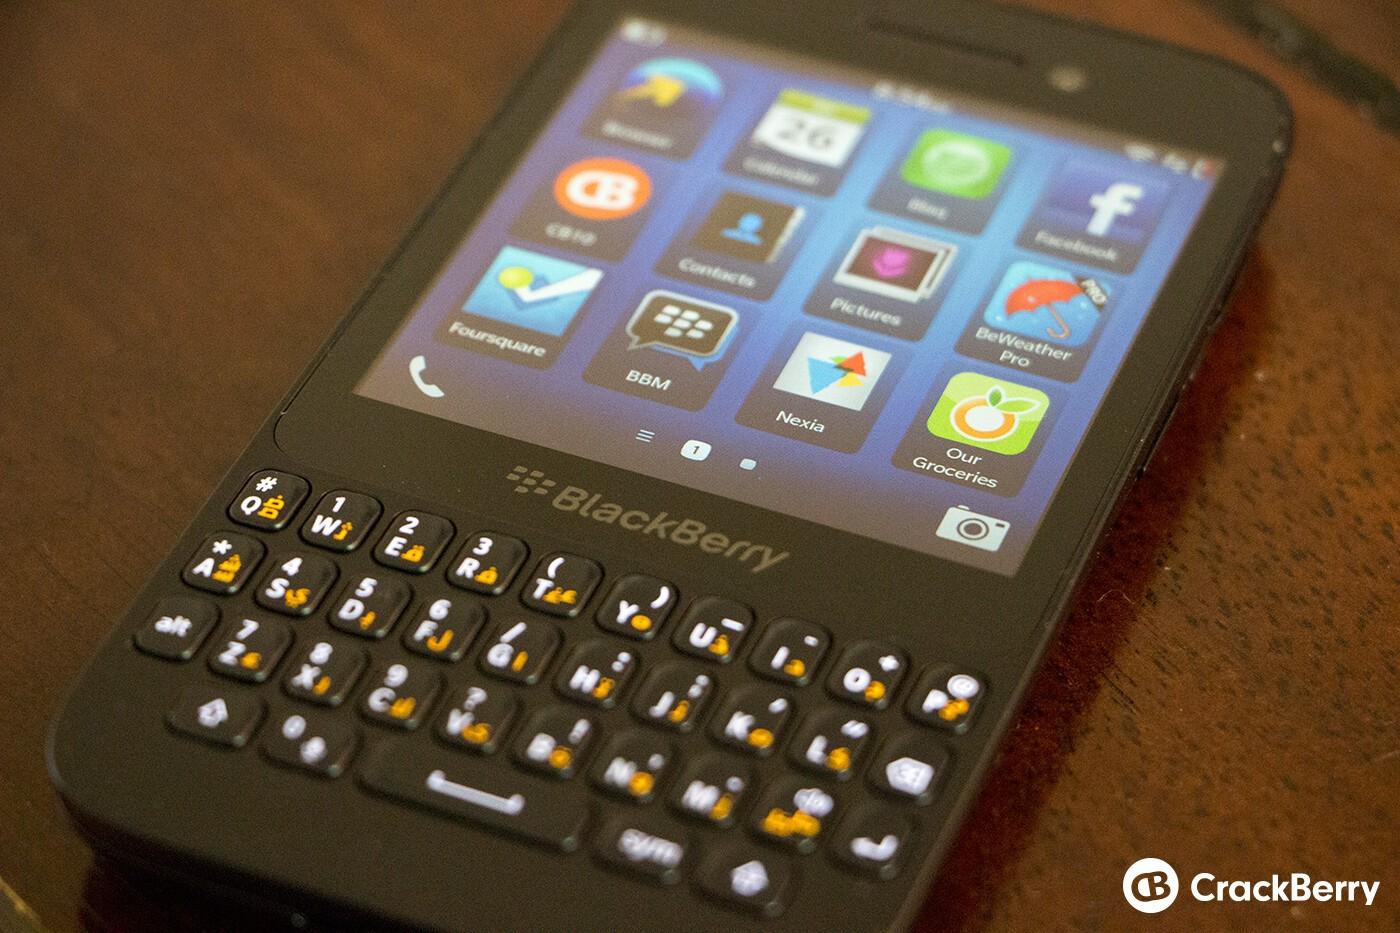 blackberry q5 release date